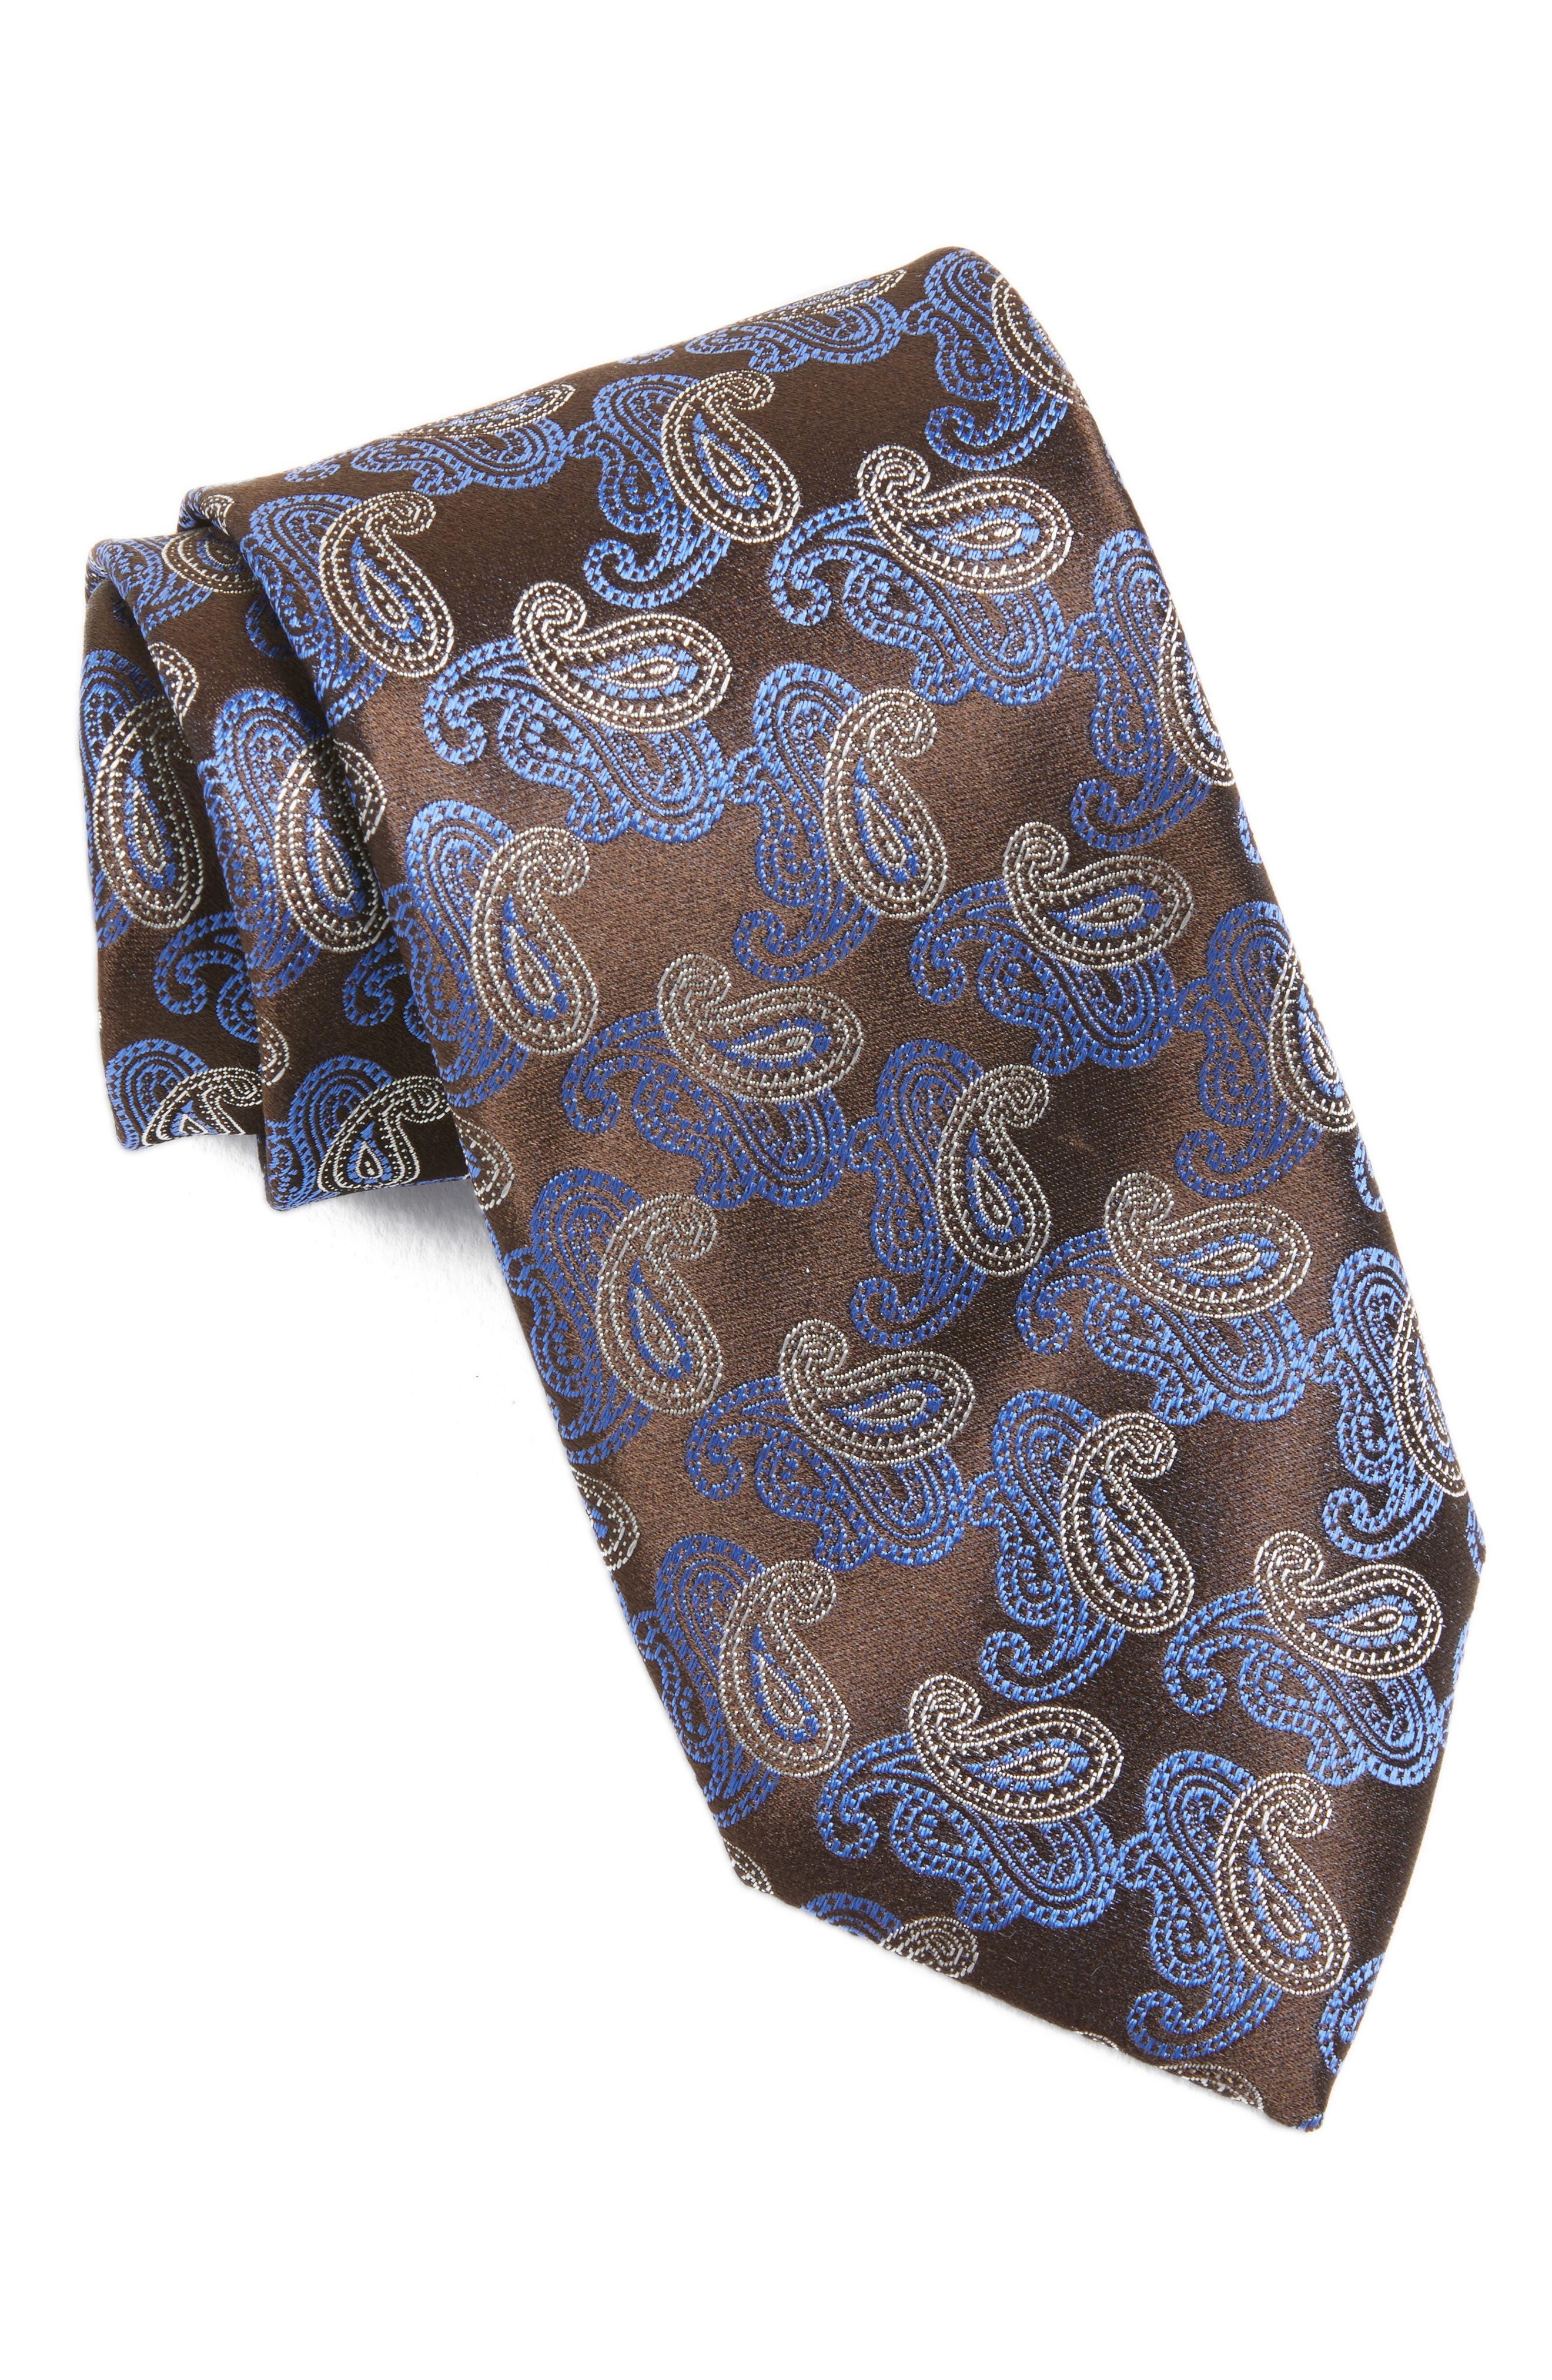 Alternate Image 1 Selected - Canali Paisley Silk Tie